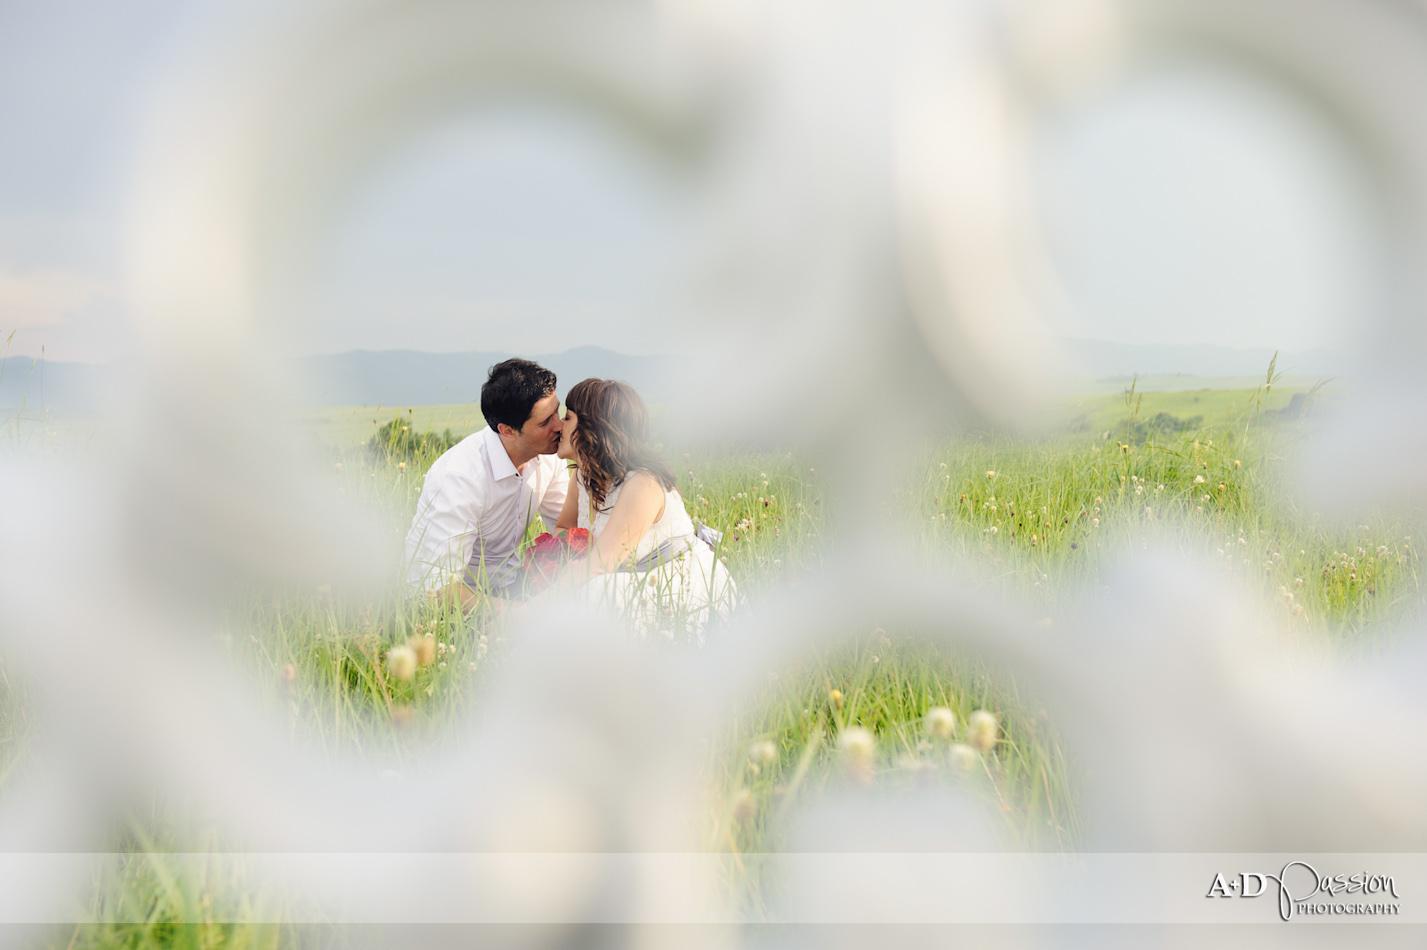 AD Passion Photography | 07042012_fotograf-profesionist-nunta_after-wedding_carmen-si-costi_0051 | Adelin, Dida, fotograf profesionist, fotograf de nunta, fotografie de nunta, fotograf Timisoara, fotograf Craiova, fotograf Bucuresti, fotograf Arad, nunta Timisoara, nunta Arad, nunta Bucuresti, nunta Craiova